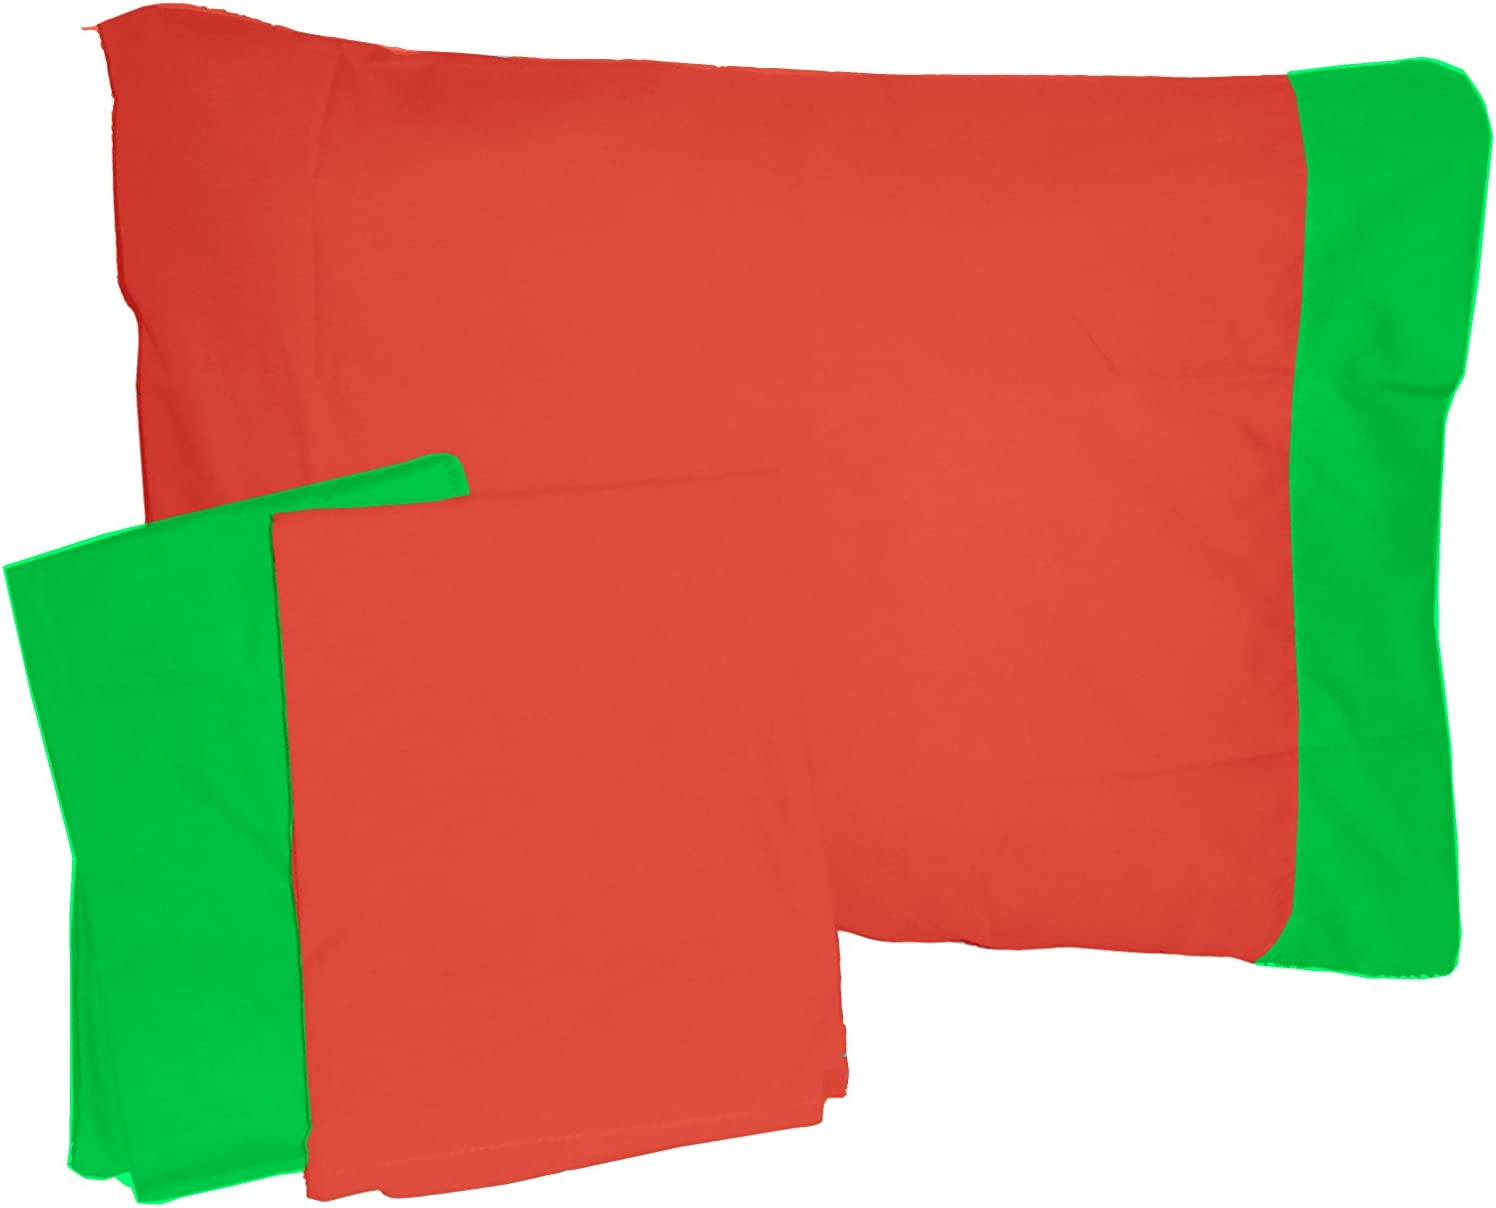 Baby Doll Bedding Solid two tone Toddler//Crib Sheet and Pillow Sham Set Orange//Apple 501css-orange//apple